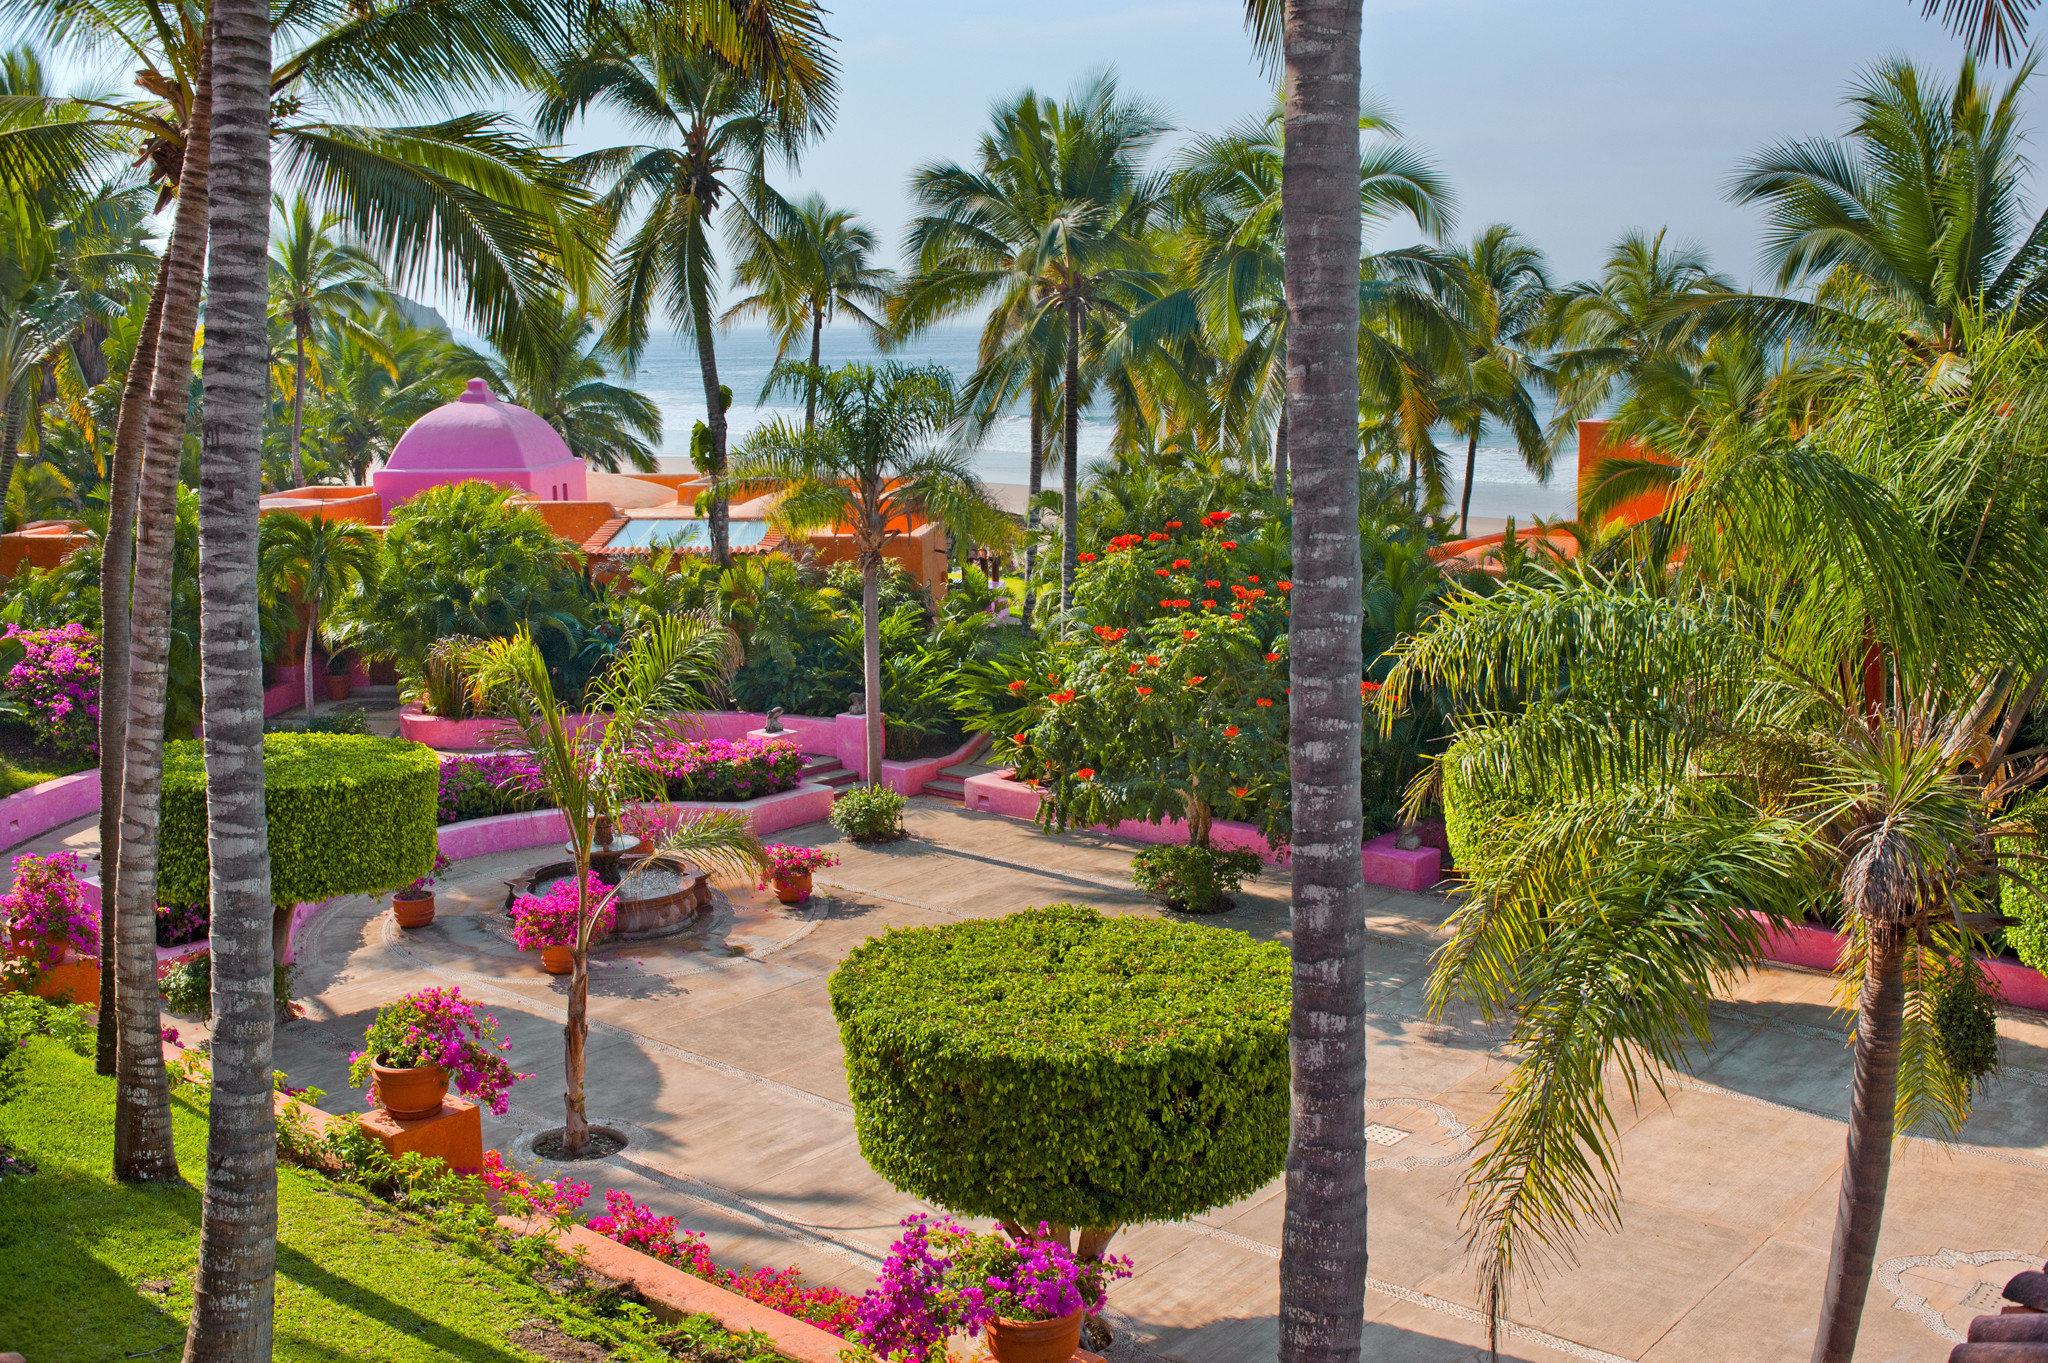 Grounds Hotels Island Romance tree sky palm Resort flora botany Garden flower plant arecales botanical garden palm family Courtyard yard lined